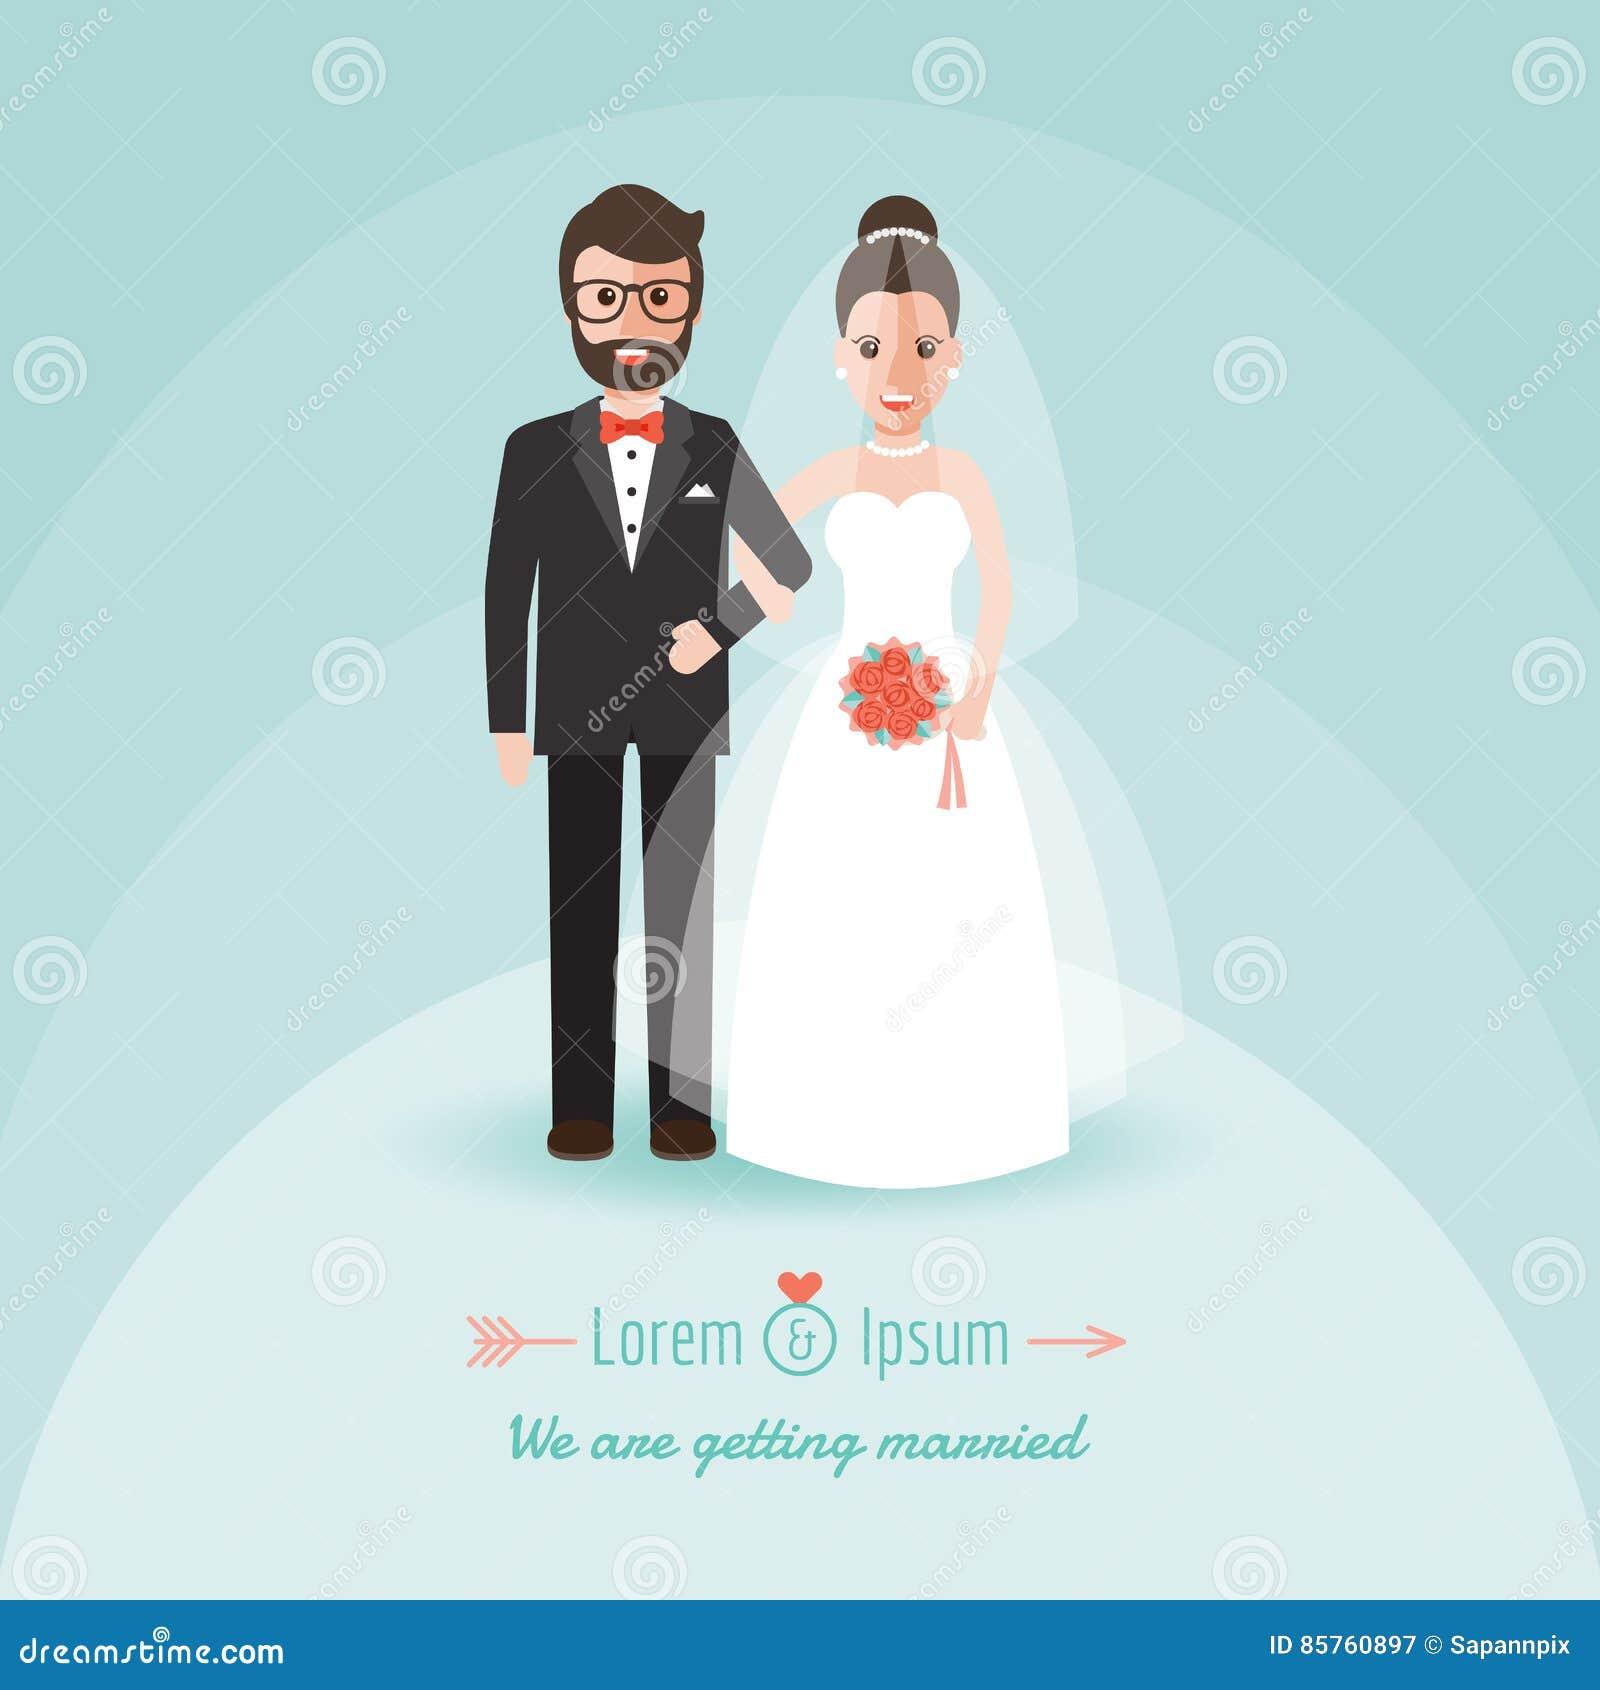 Wedding day thumbs